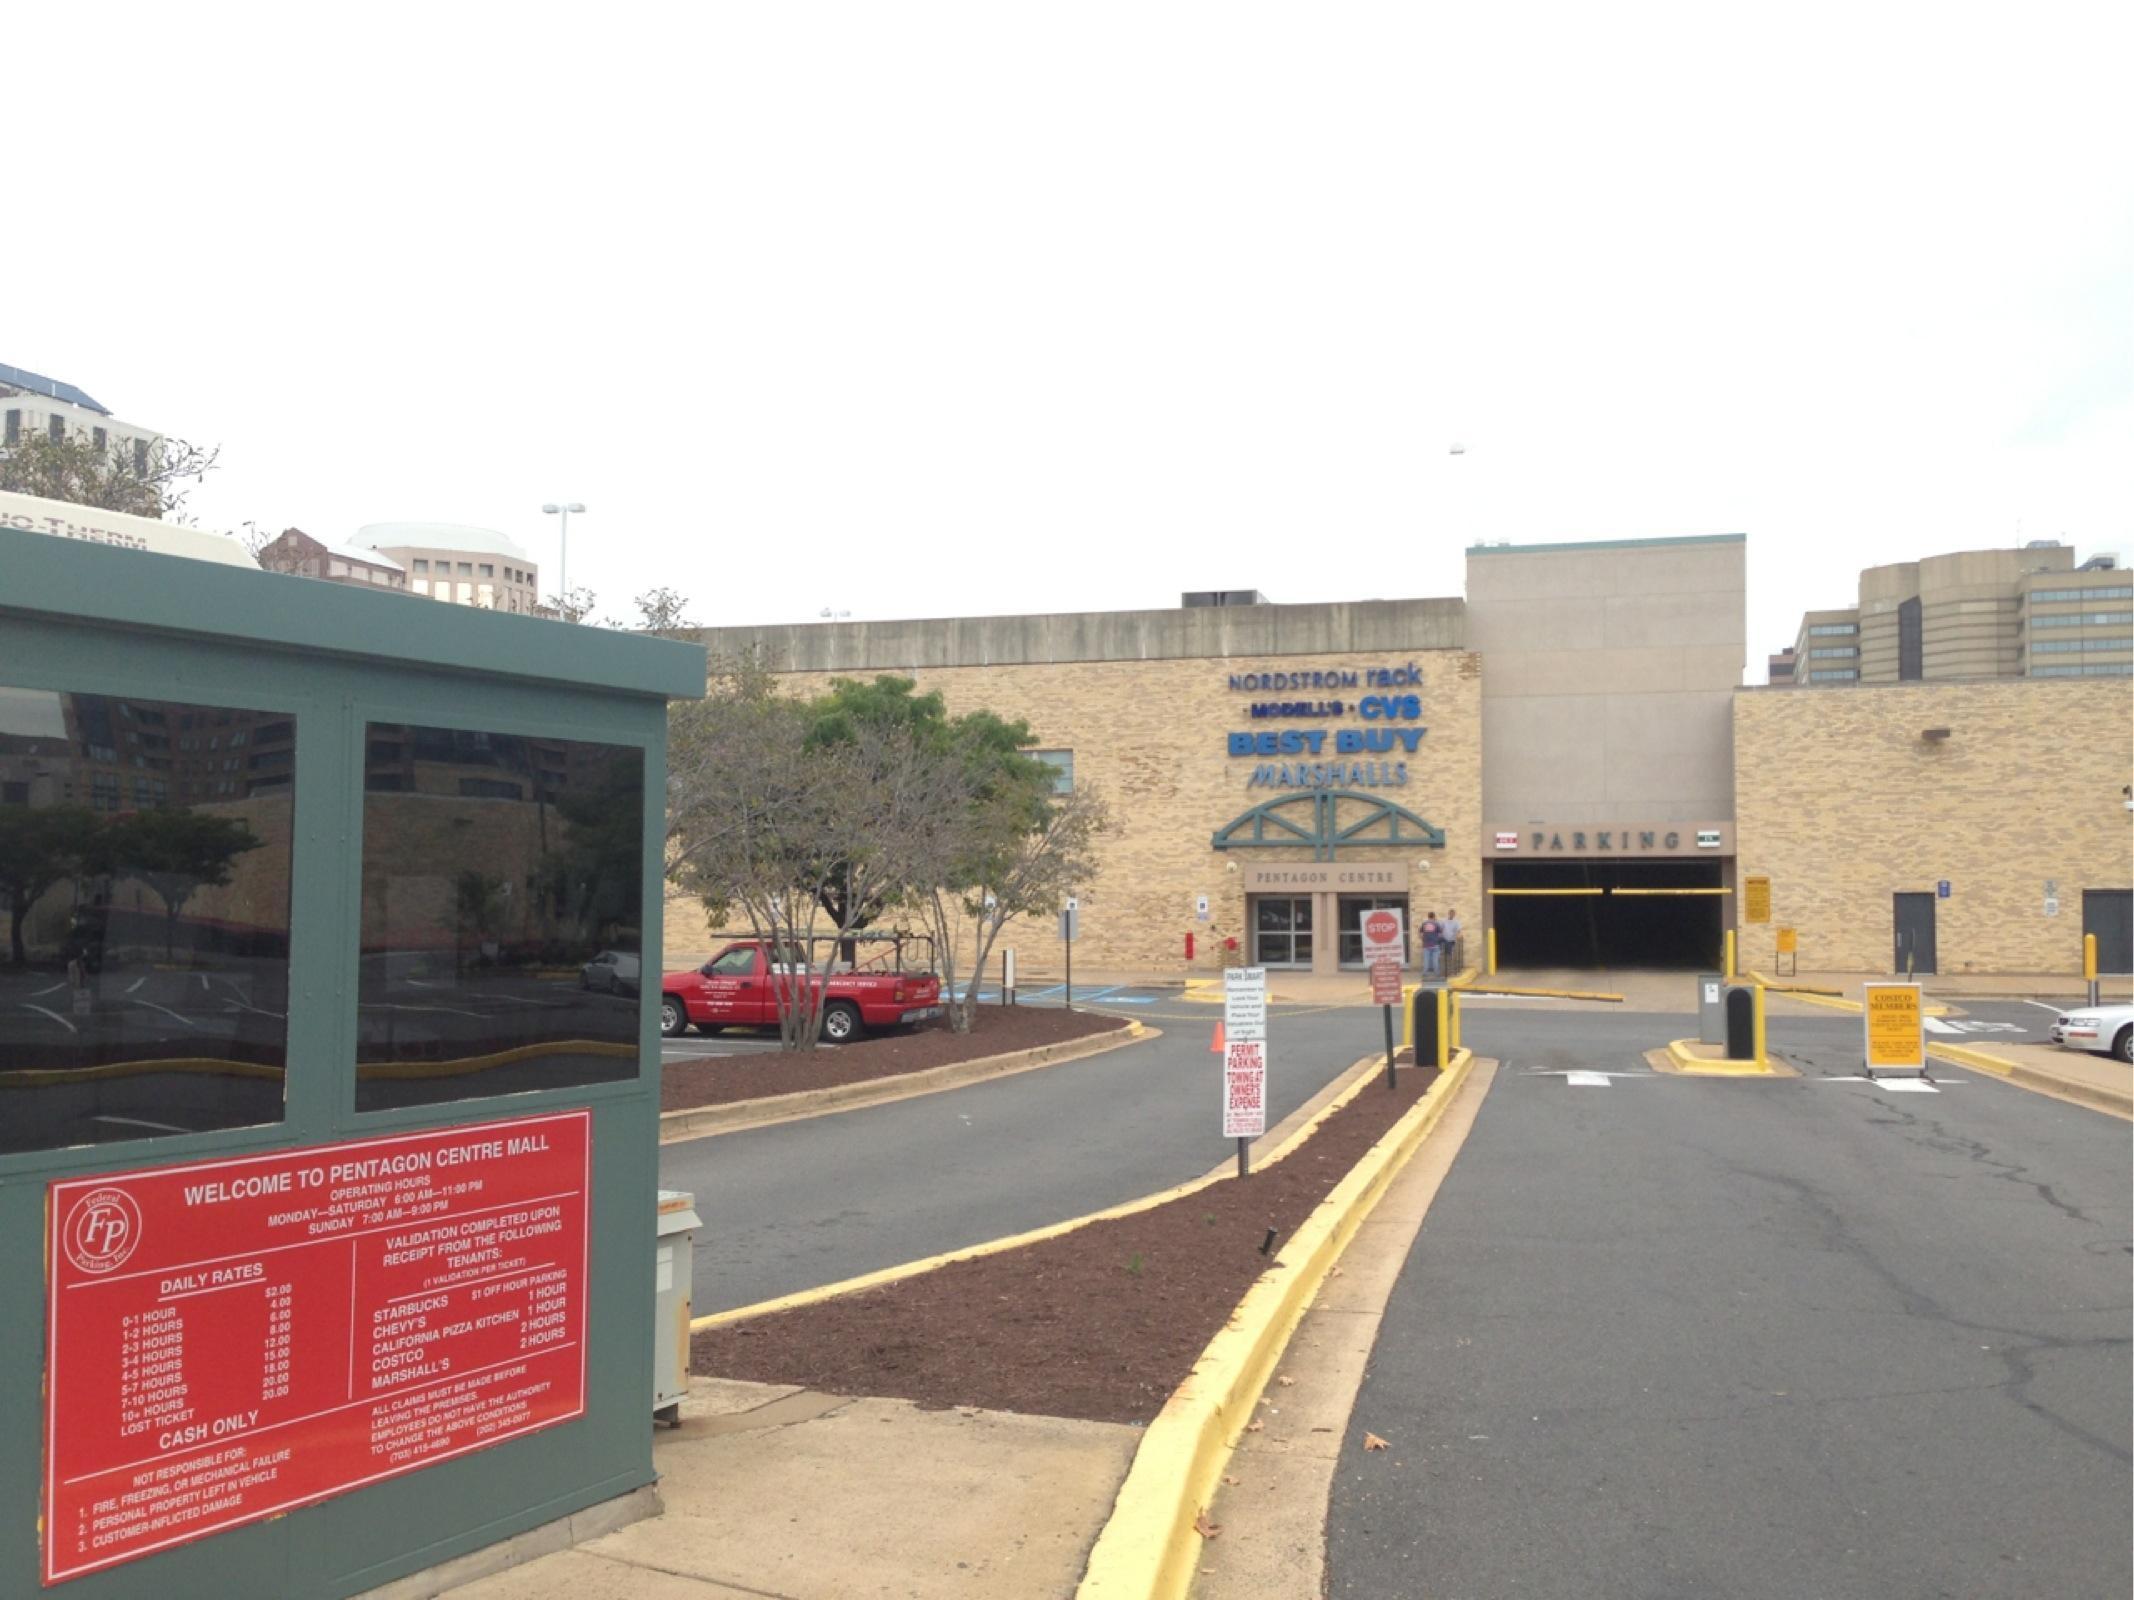 Pentagon Centre Mall Parkplatz In Arlington Parkme